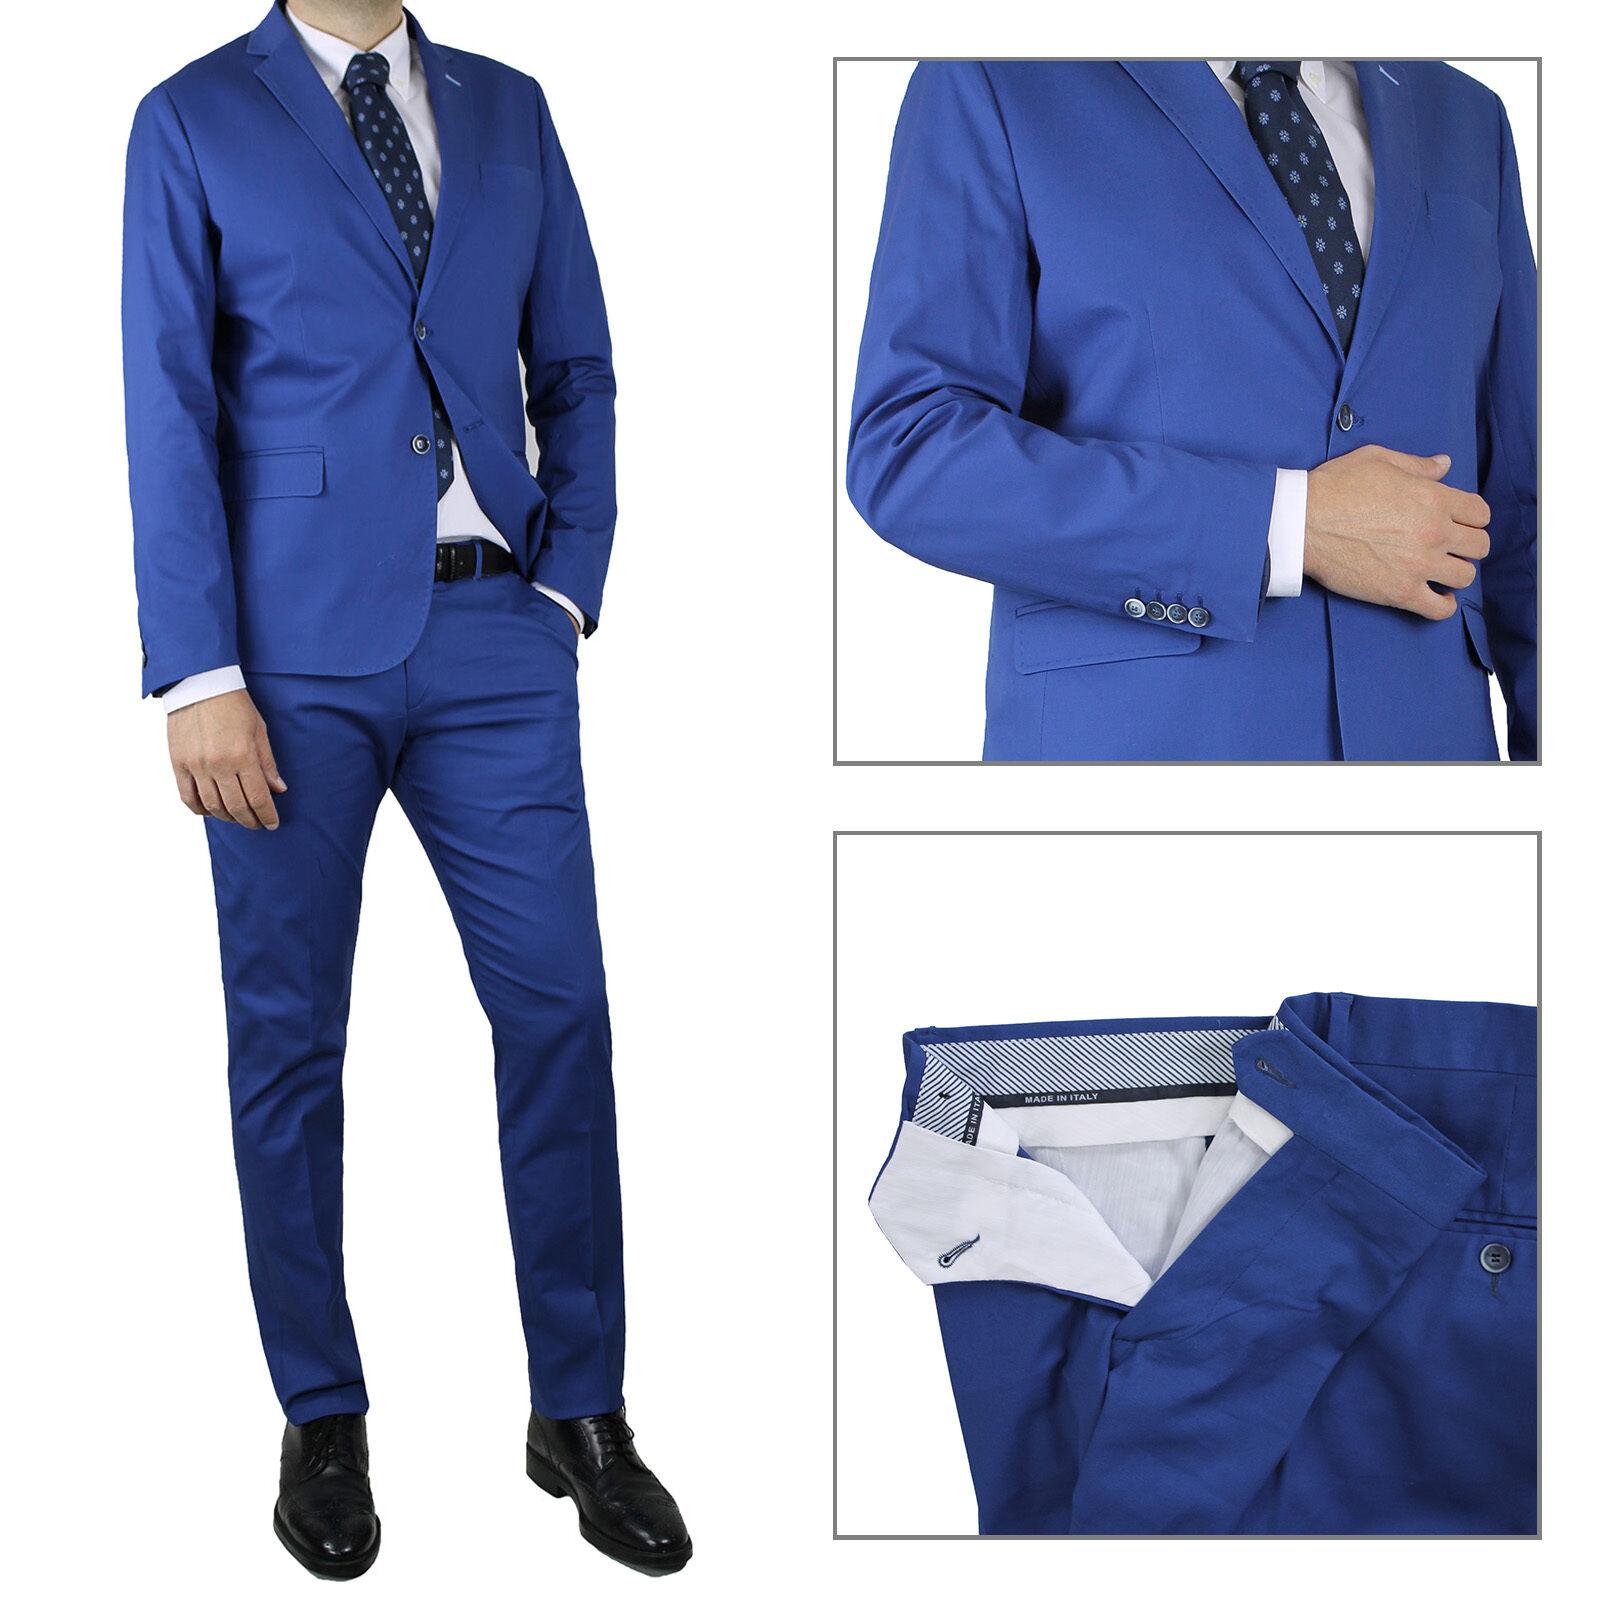 Kleid Men Marineblau élégant slim fit Kleid Baumwolle Zeremonie sartoriale